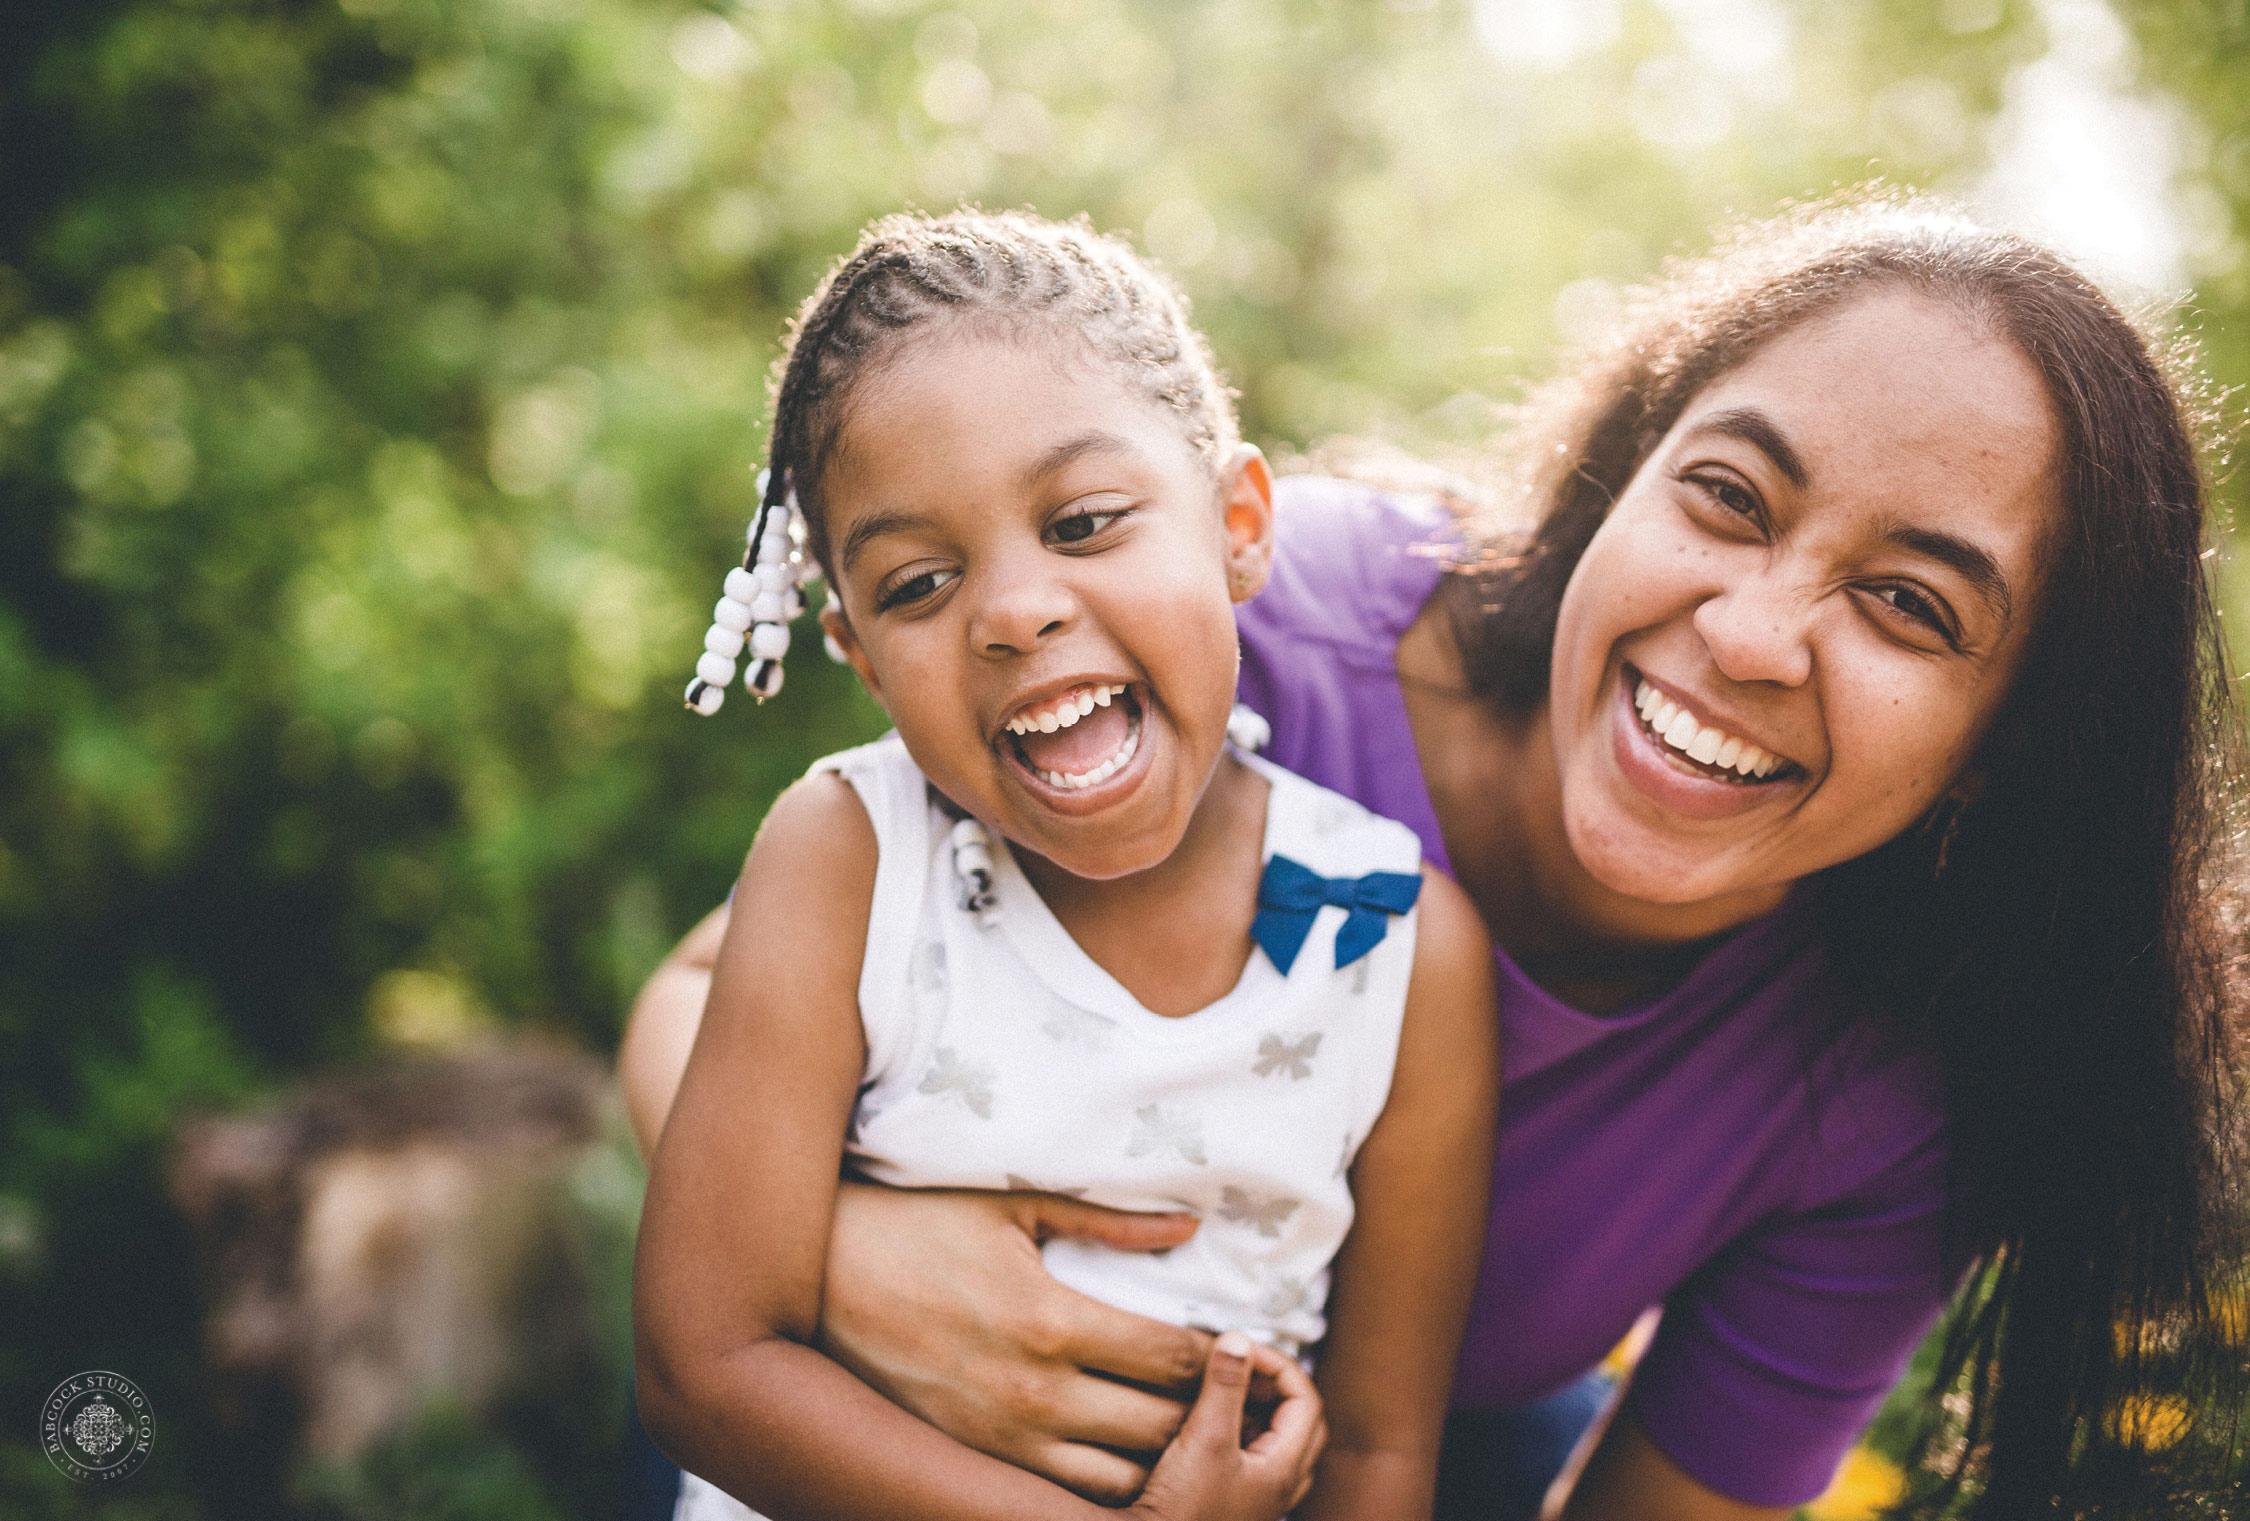 ladd-family-children-photographer-dayton-ohio-4.jpg